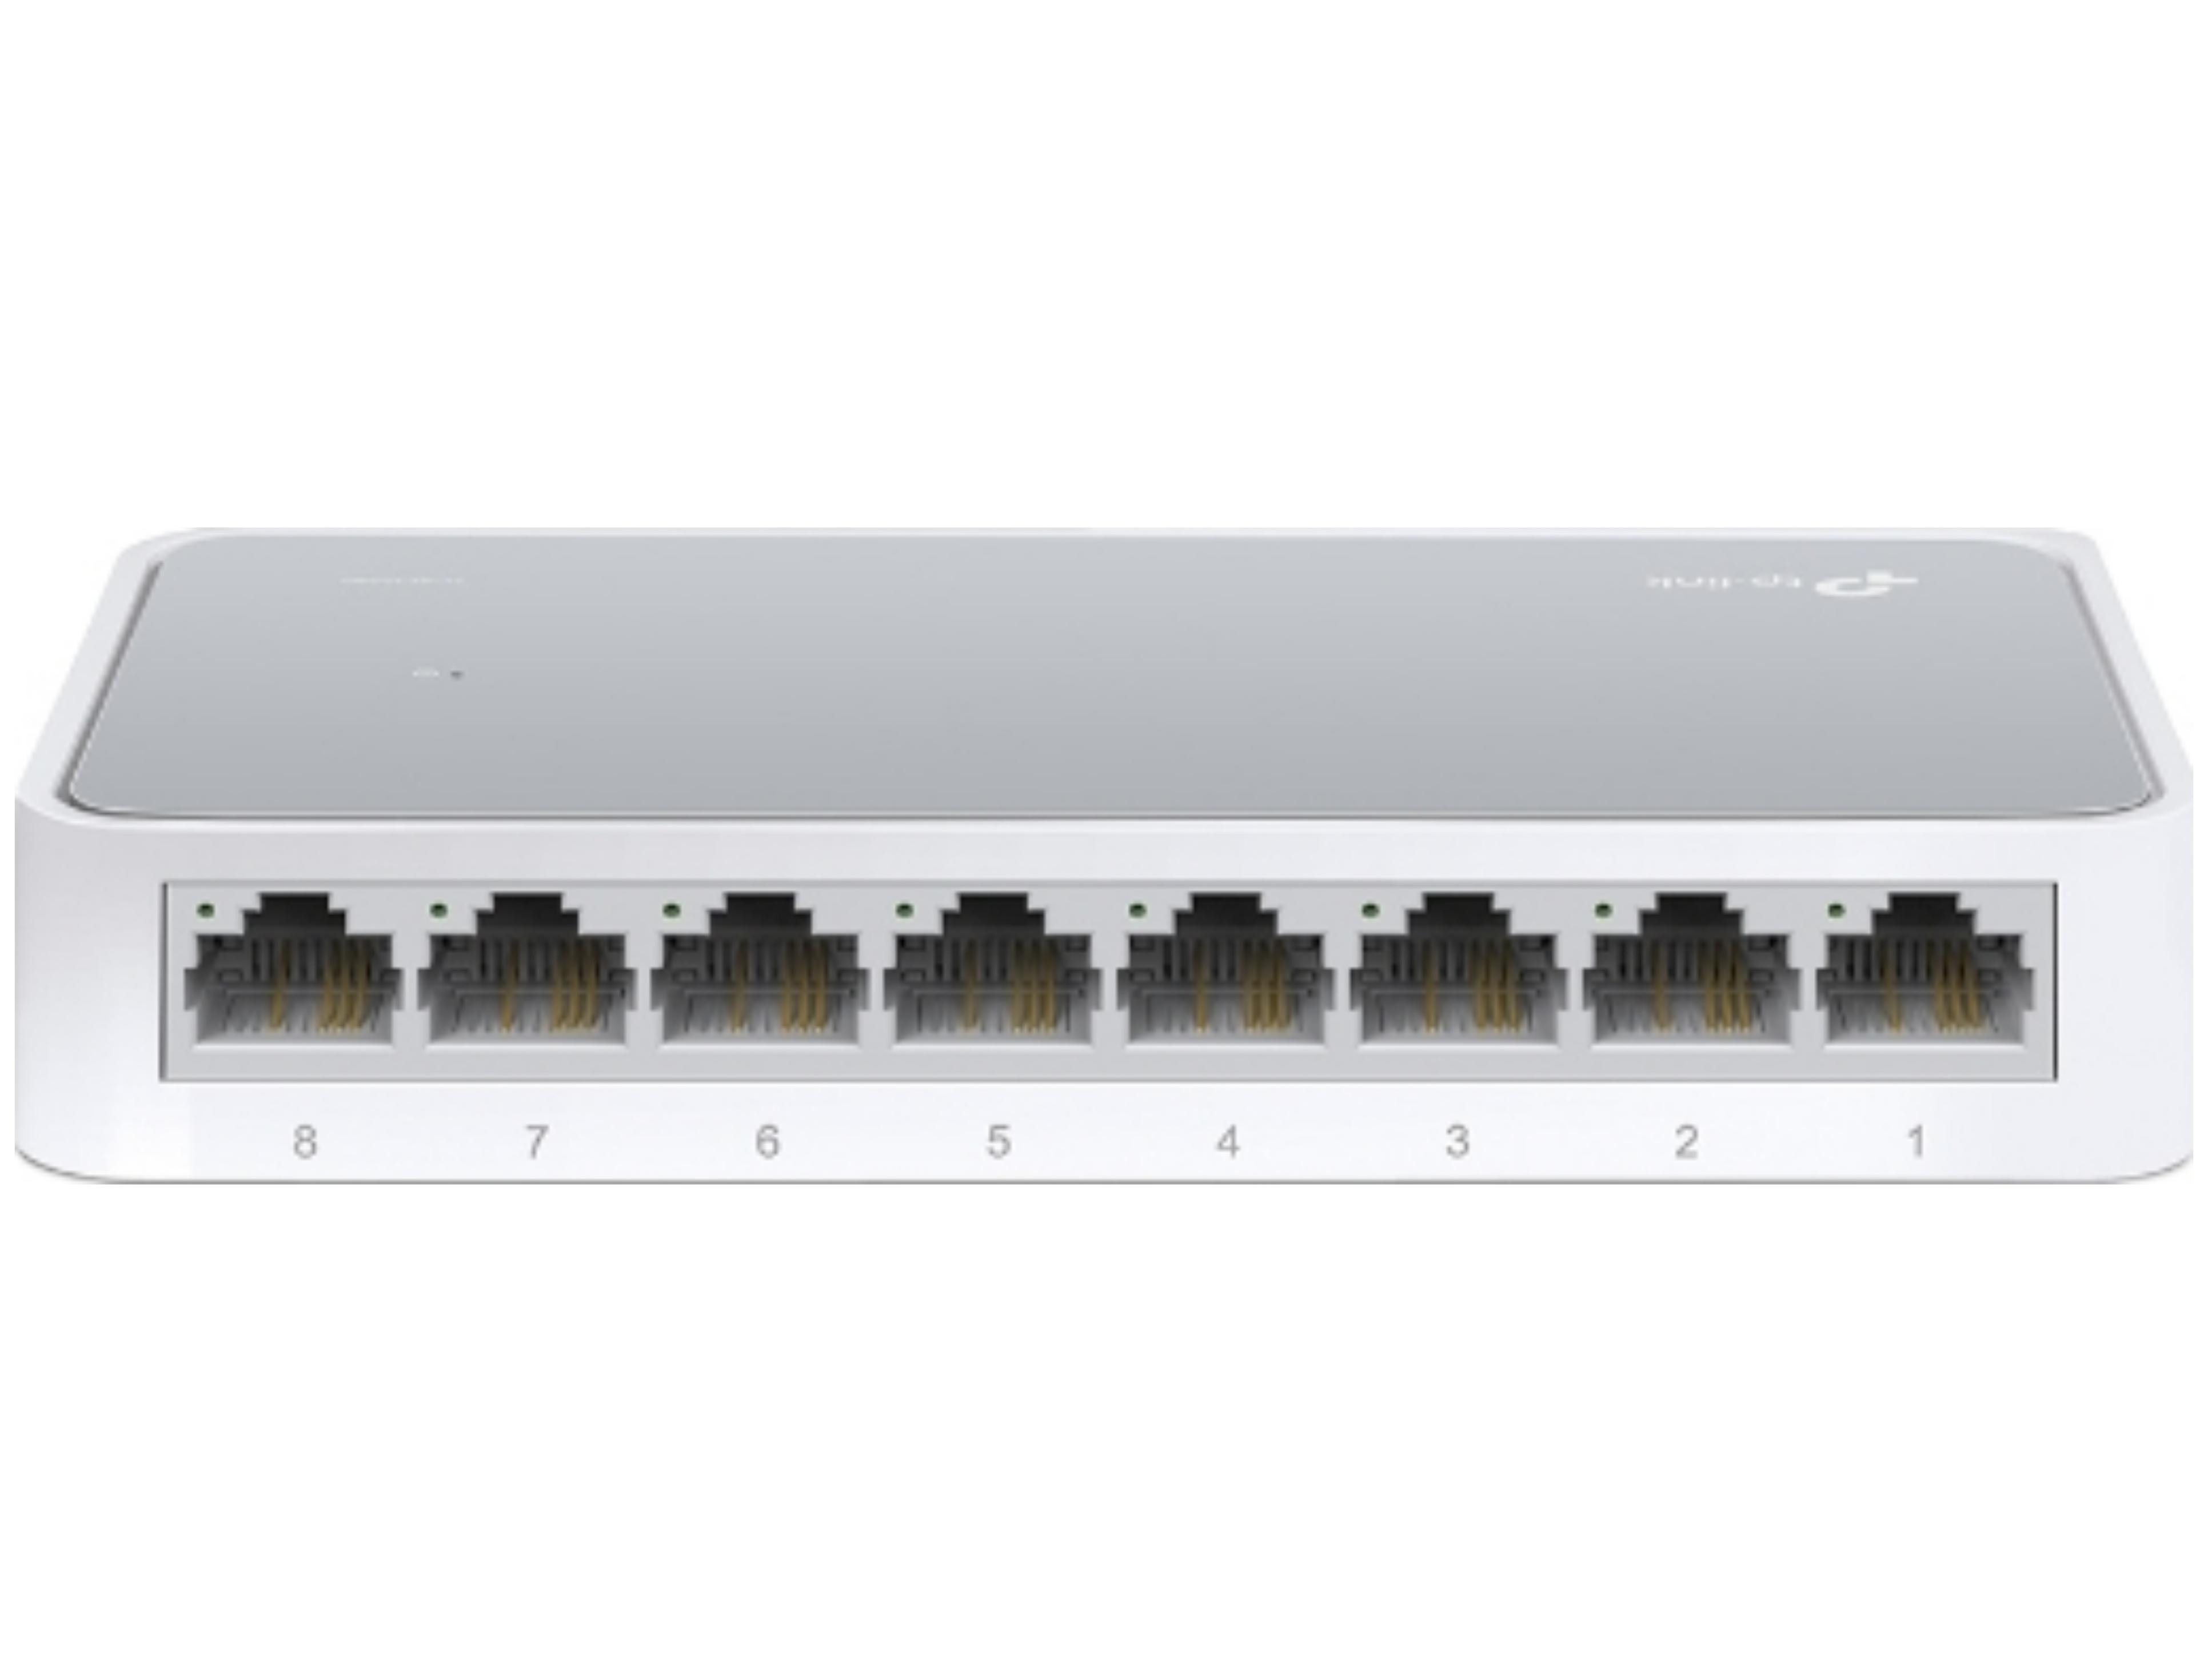 TP-LINK TL-SF1008D Unmanaged L2 Switch με 8 Θύρες Ethernet